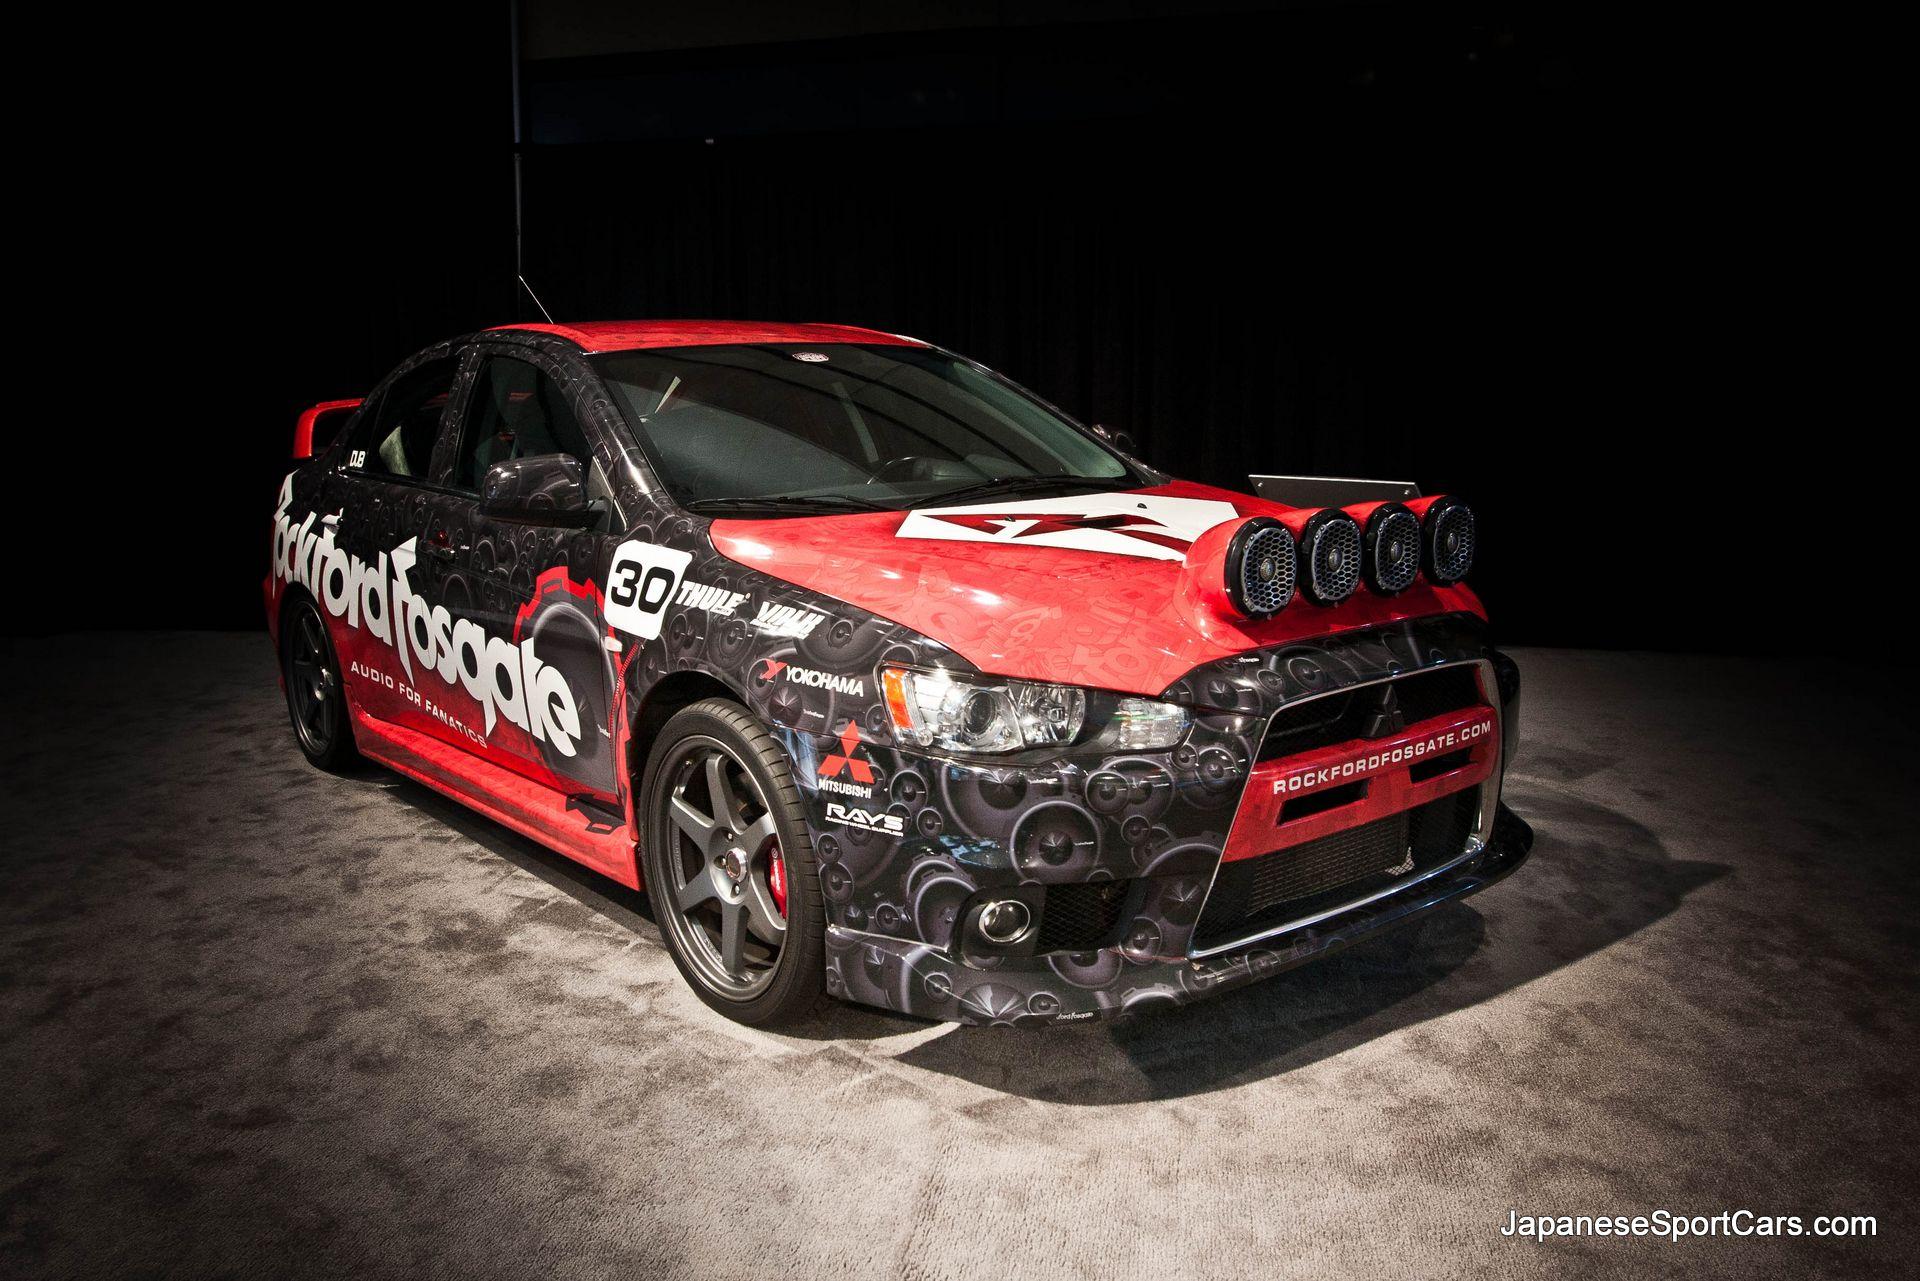 Mitsubishi EVO Rockford Fosgate Rally Edition at 2012 Los Angeles Auto 1920x1281